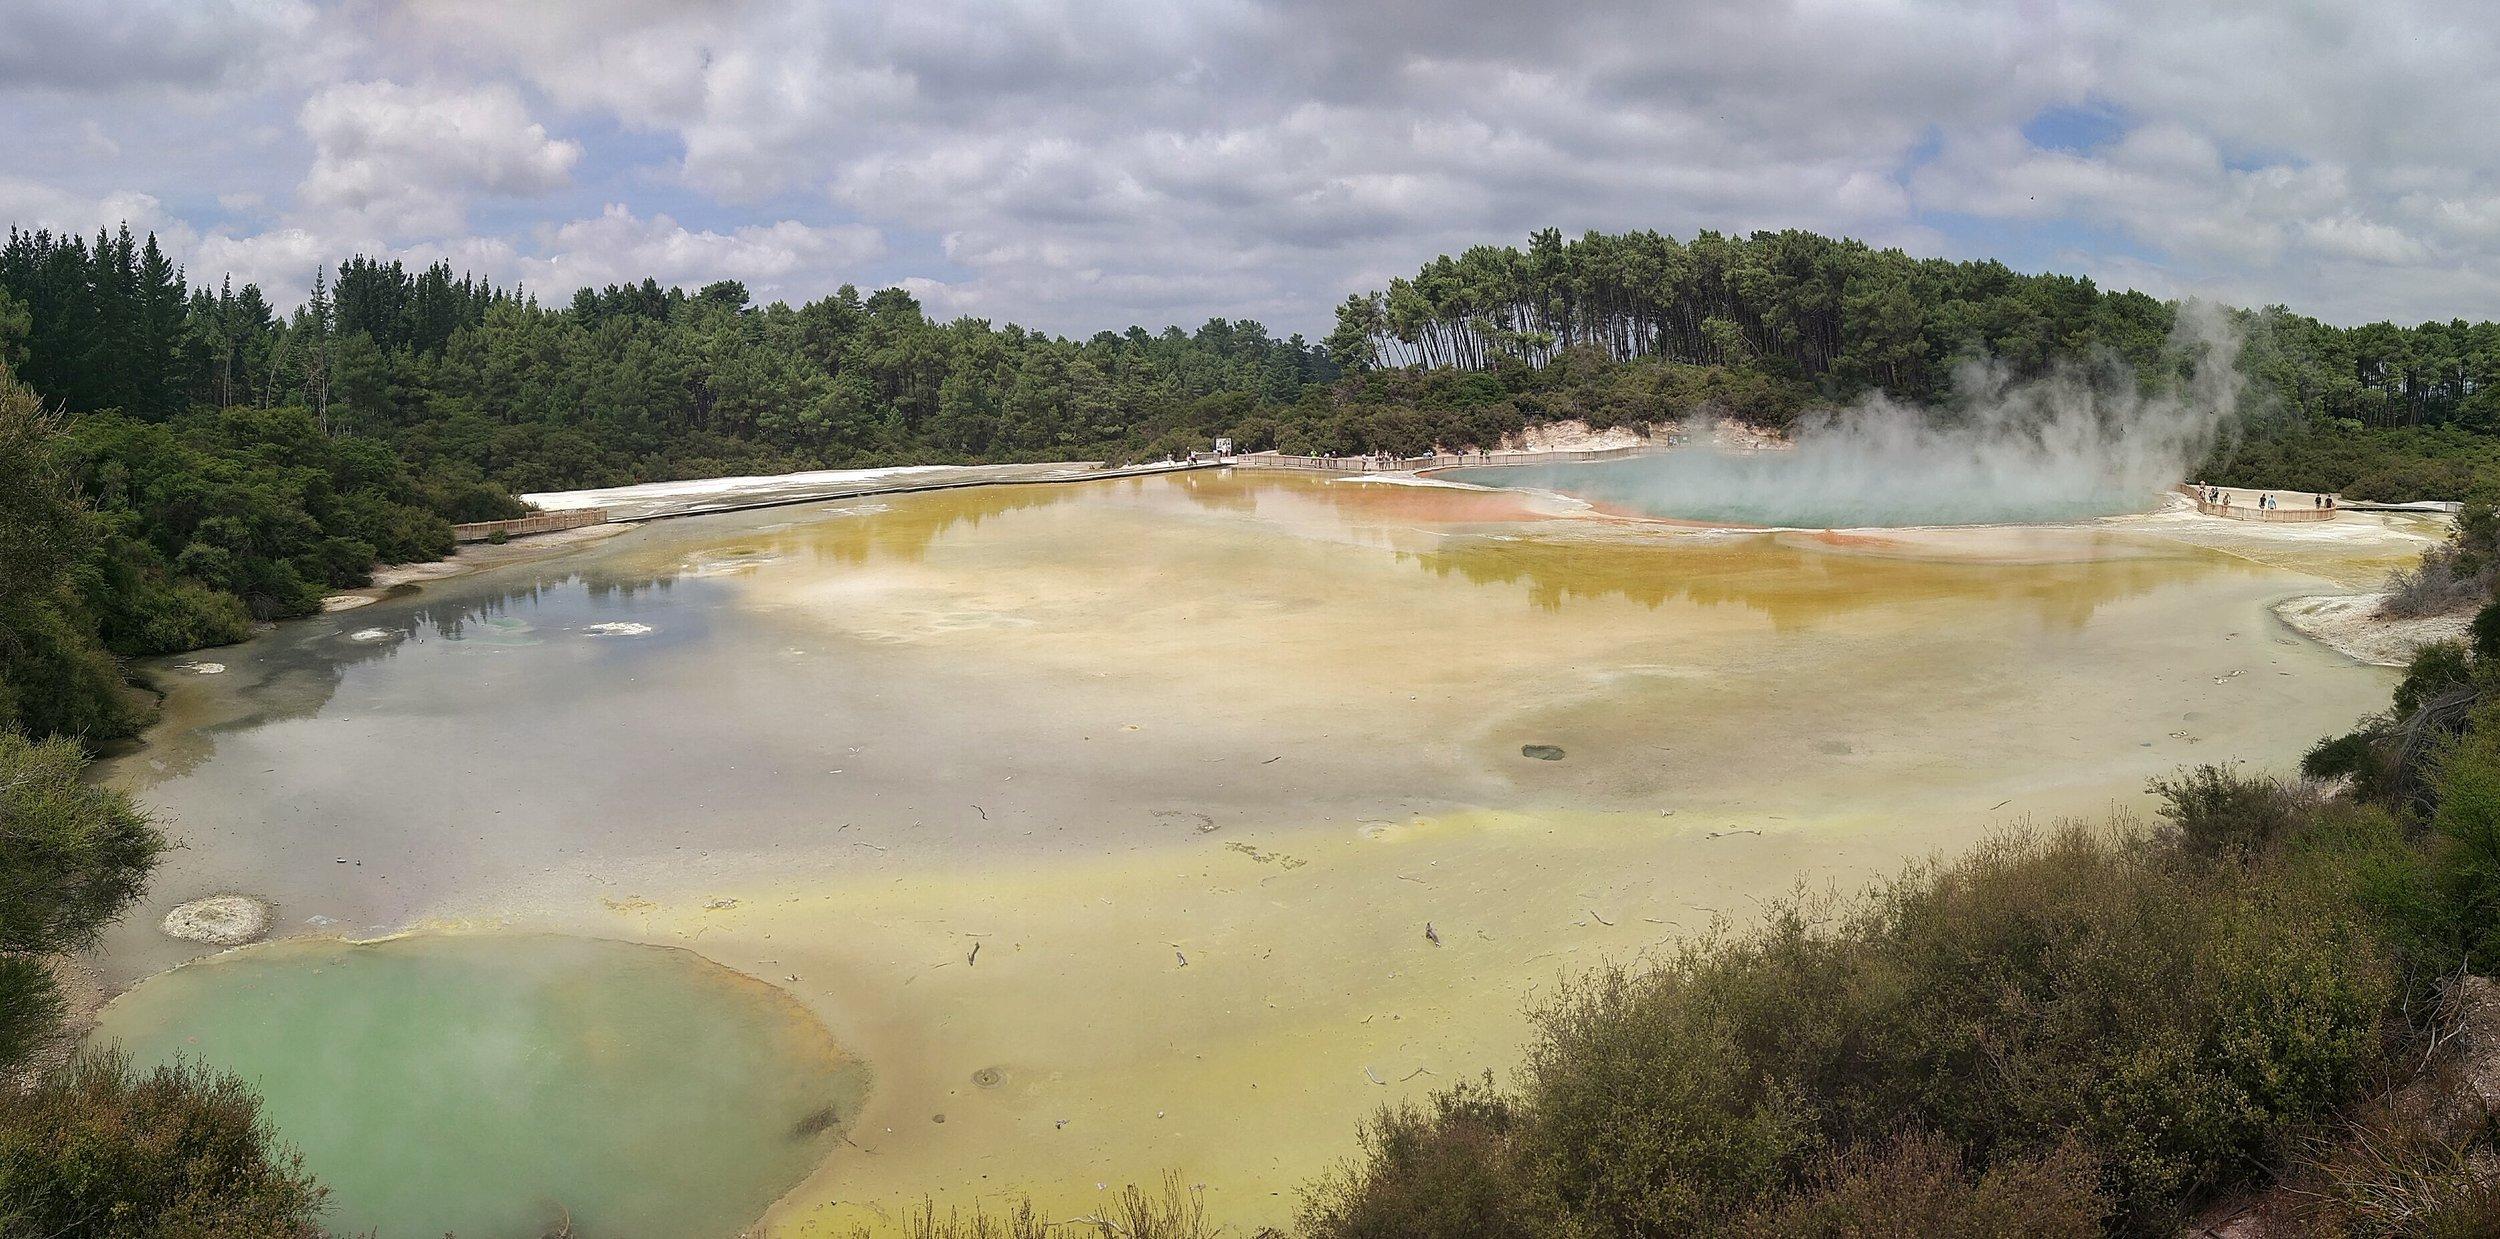 Wai o tapu Thermal Wonderland Rotorua